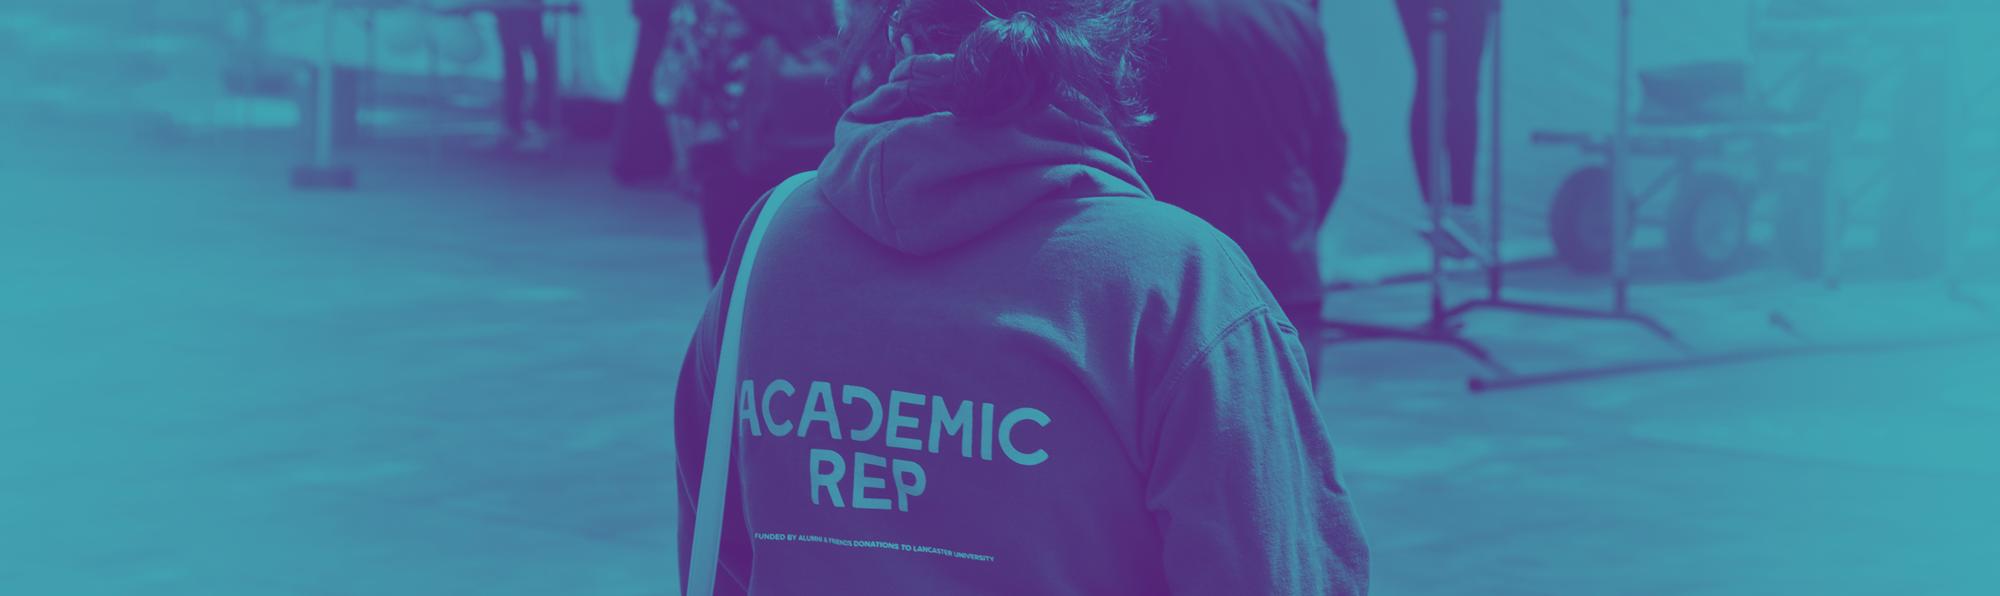 Lancaster University Academic Rep